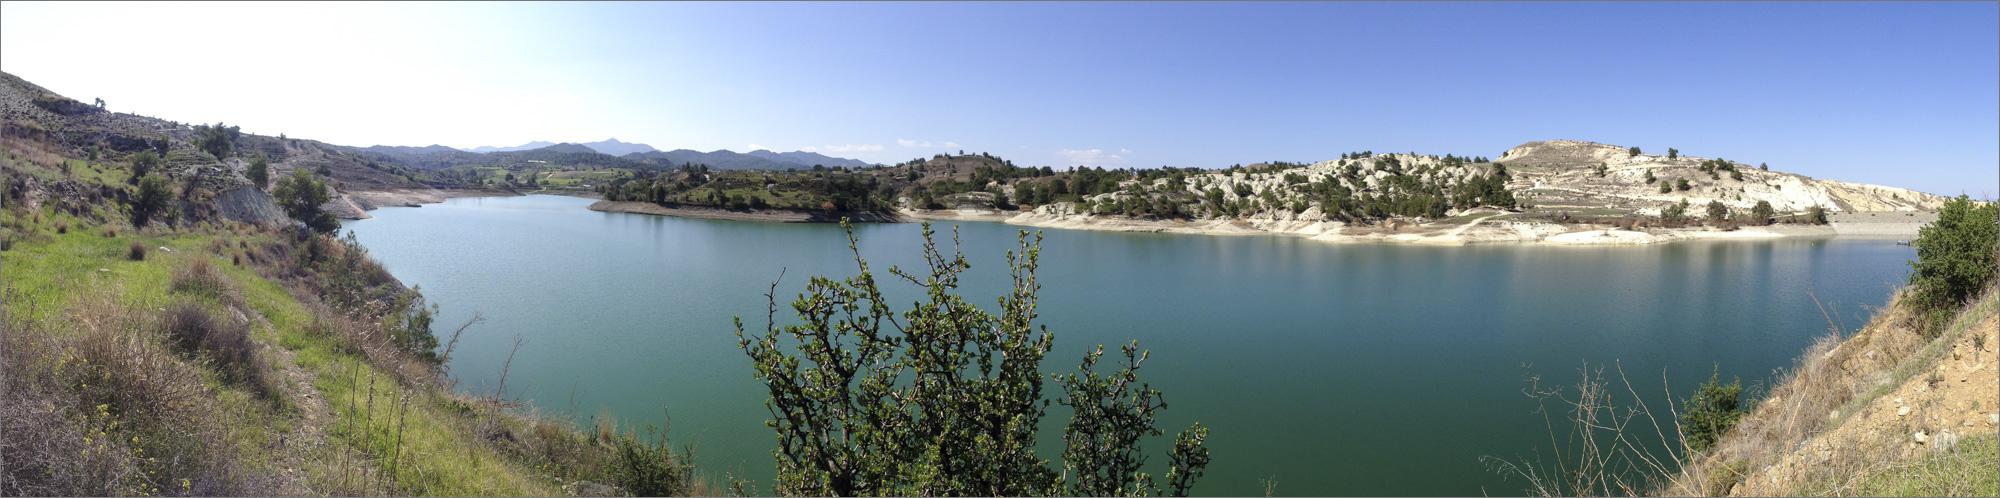 Tamassos Reservoir near Pera Orinis